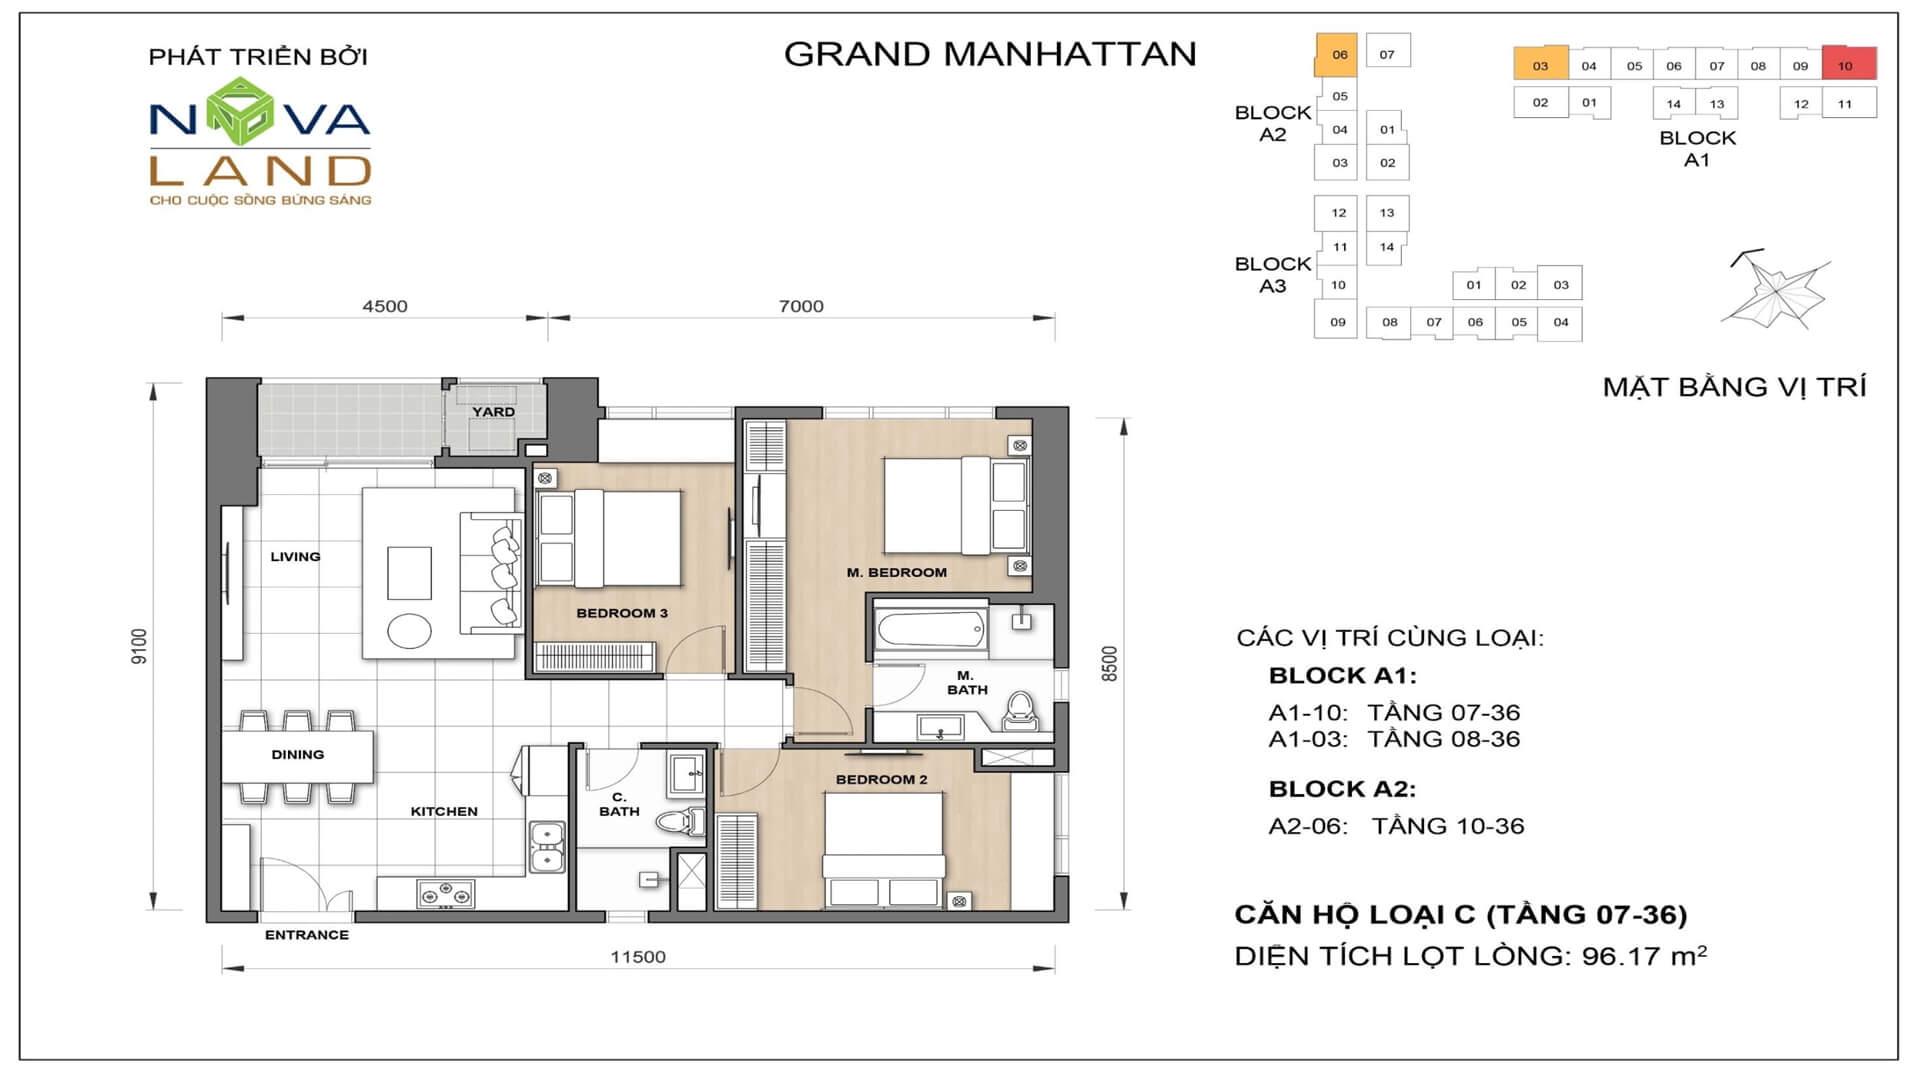 Ban-Ve-Ky-Thuat-Can-Ho-Du-An-Grand-Manhattan-Q1-HCM-Novaland-dien-tich-lot-long-96.17m2